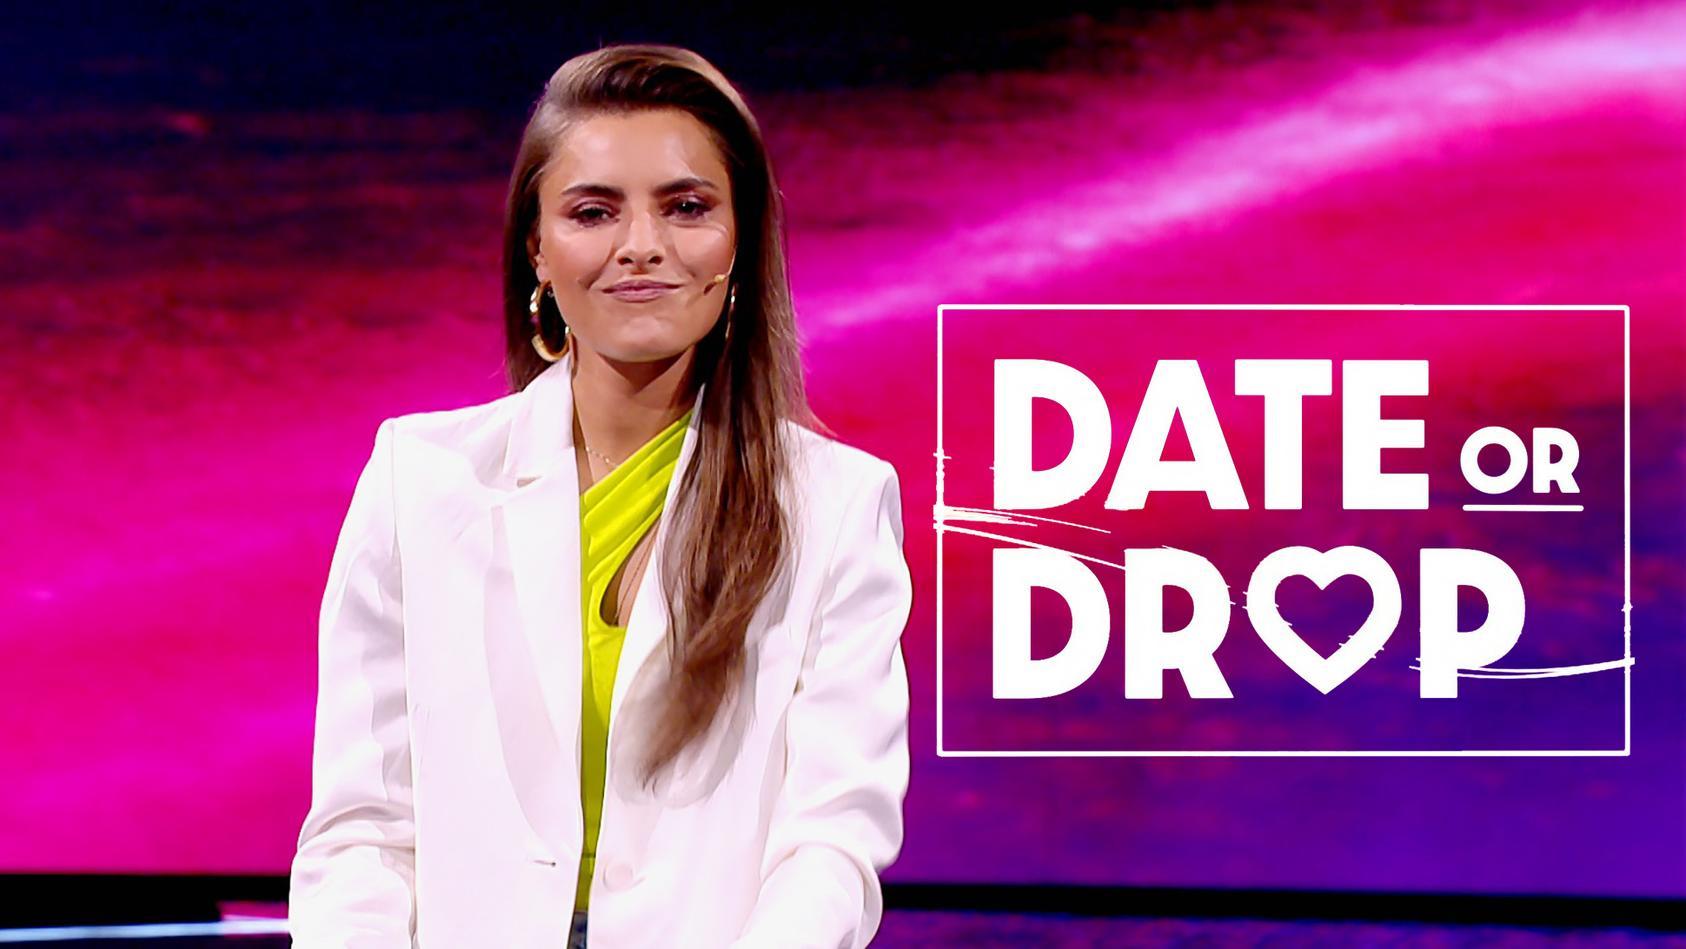 date-or-drop-folge-2-sophia-thomalla-bittet-zum-action-dating